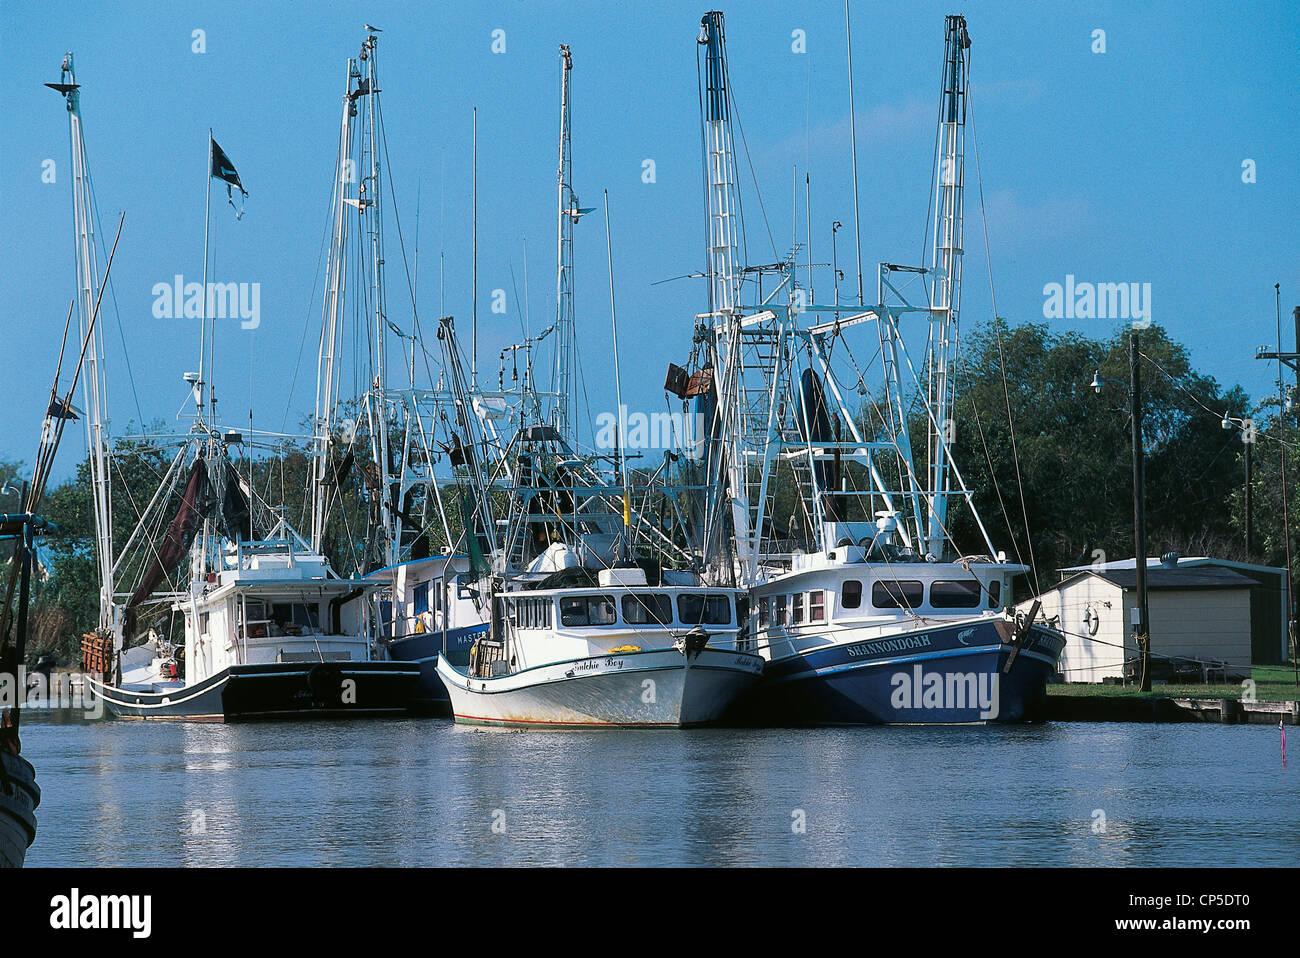 UNITED STATES OF AMERICA LOUISIANA Houma VESSELS - Stock Image